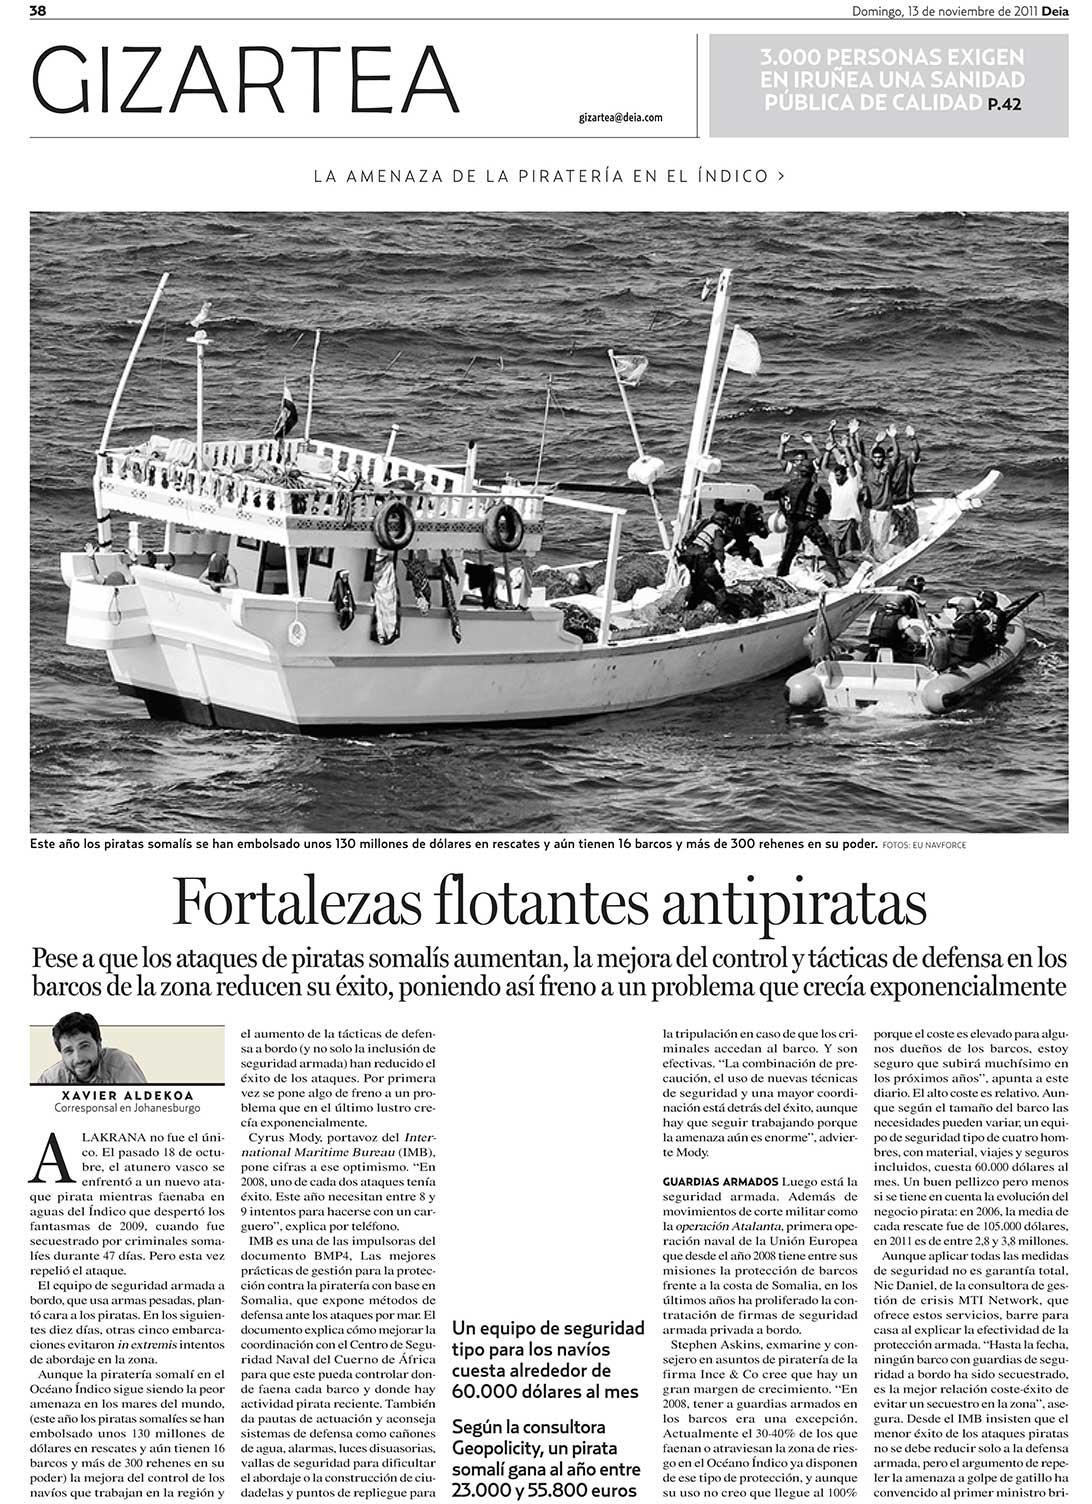 Fortalezas flotantes antipiratas